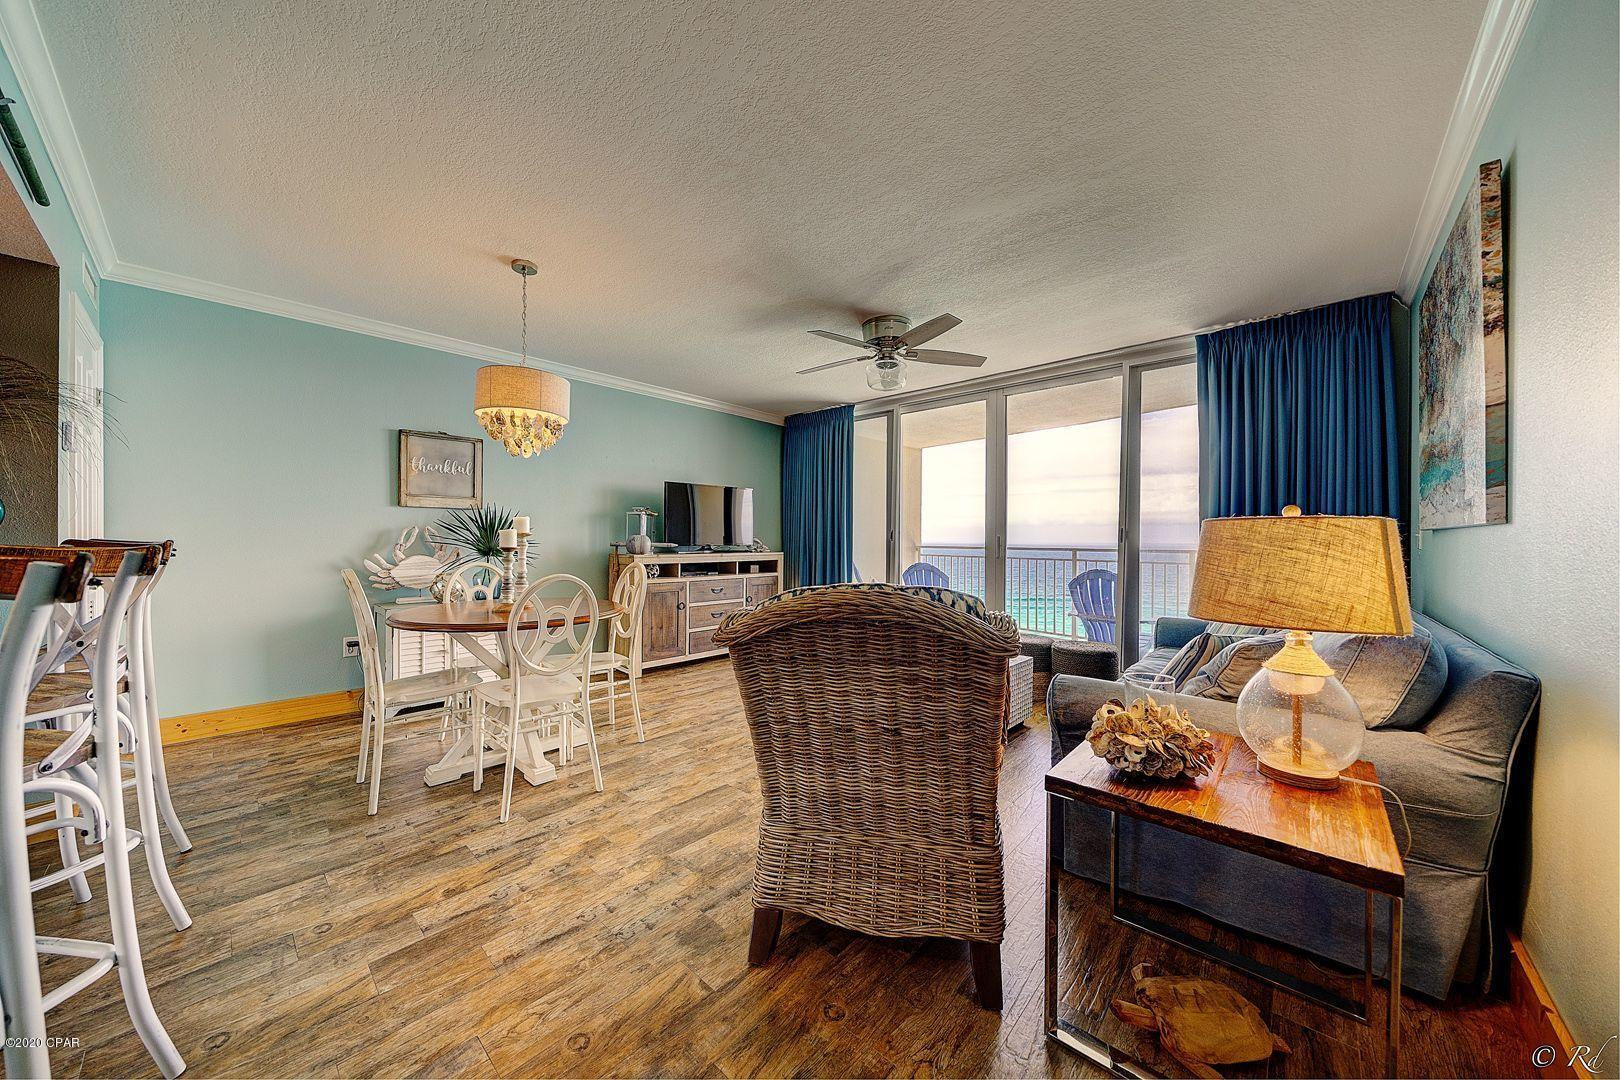 A 1 Bedroom 1 Bedroom Emerald Beach Resort Condominium